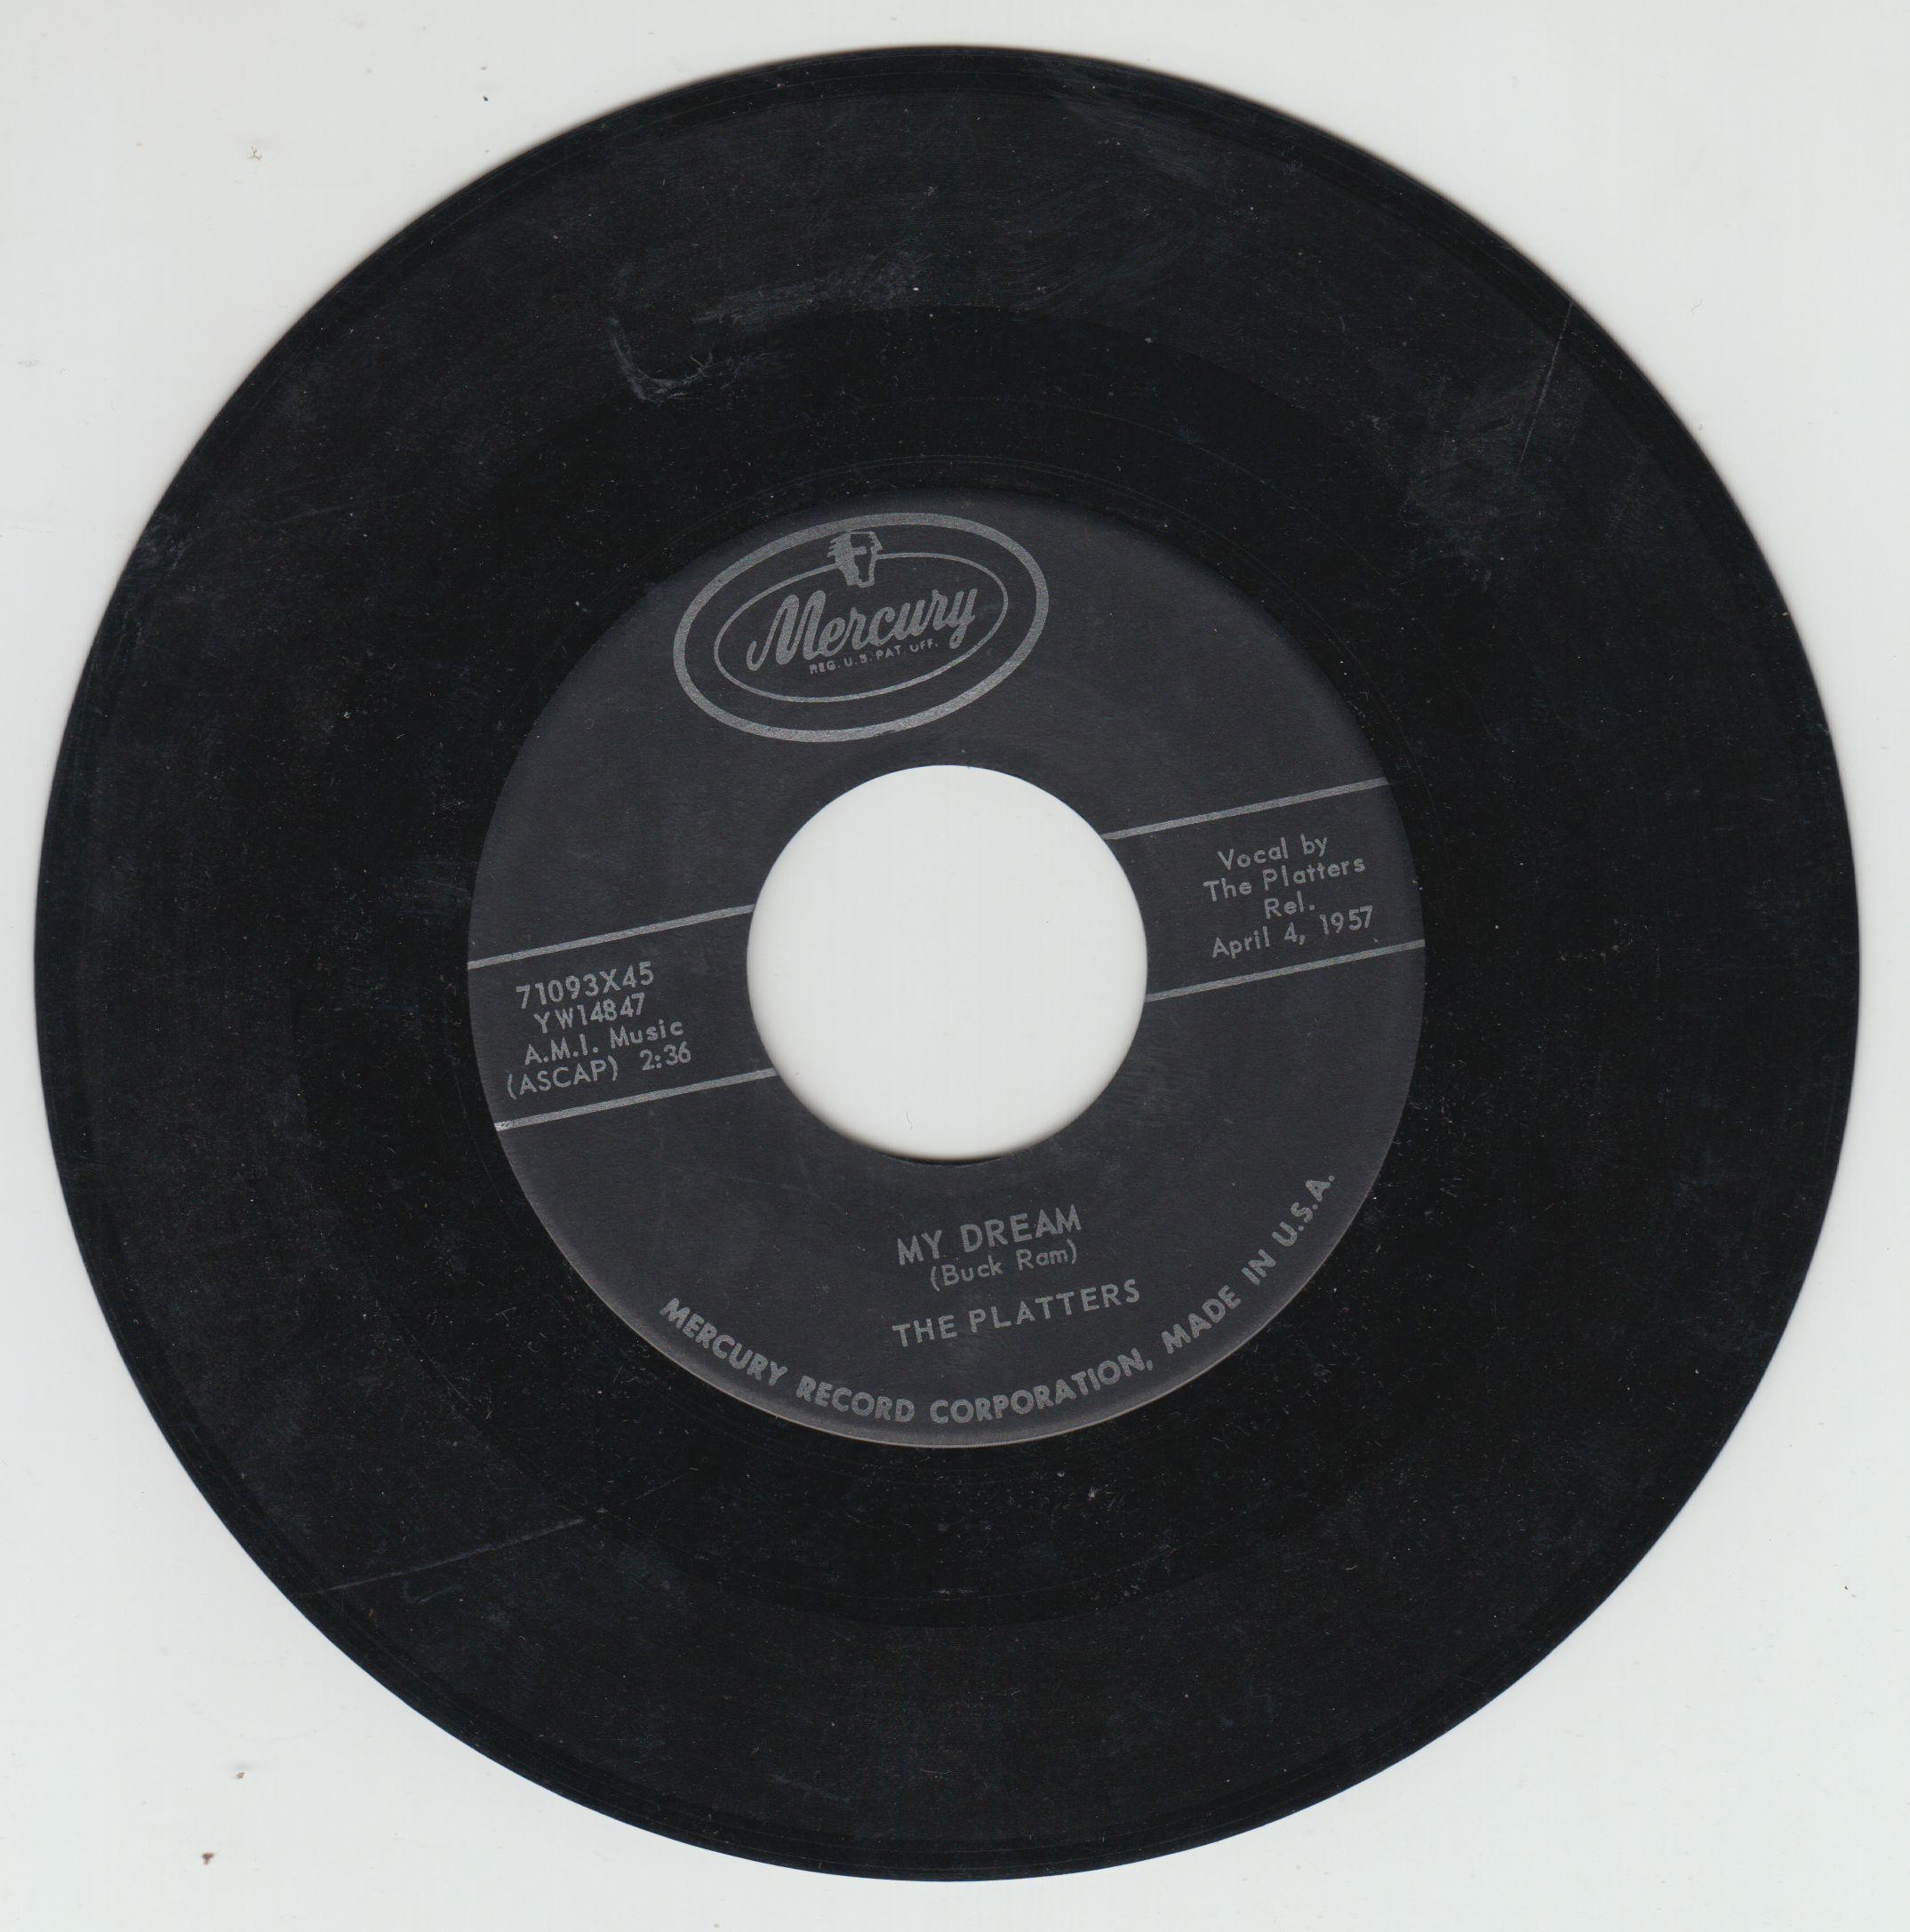 The Platters I Wanna Mercury 71093x45 1957 45 Rpm Doo